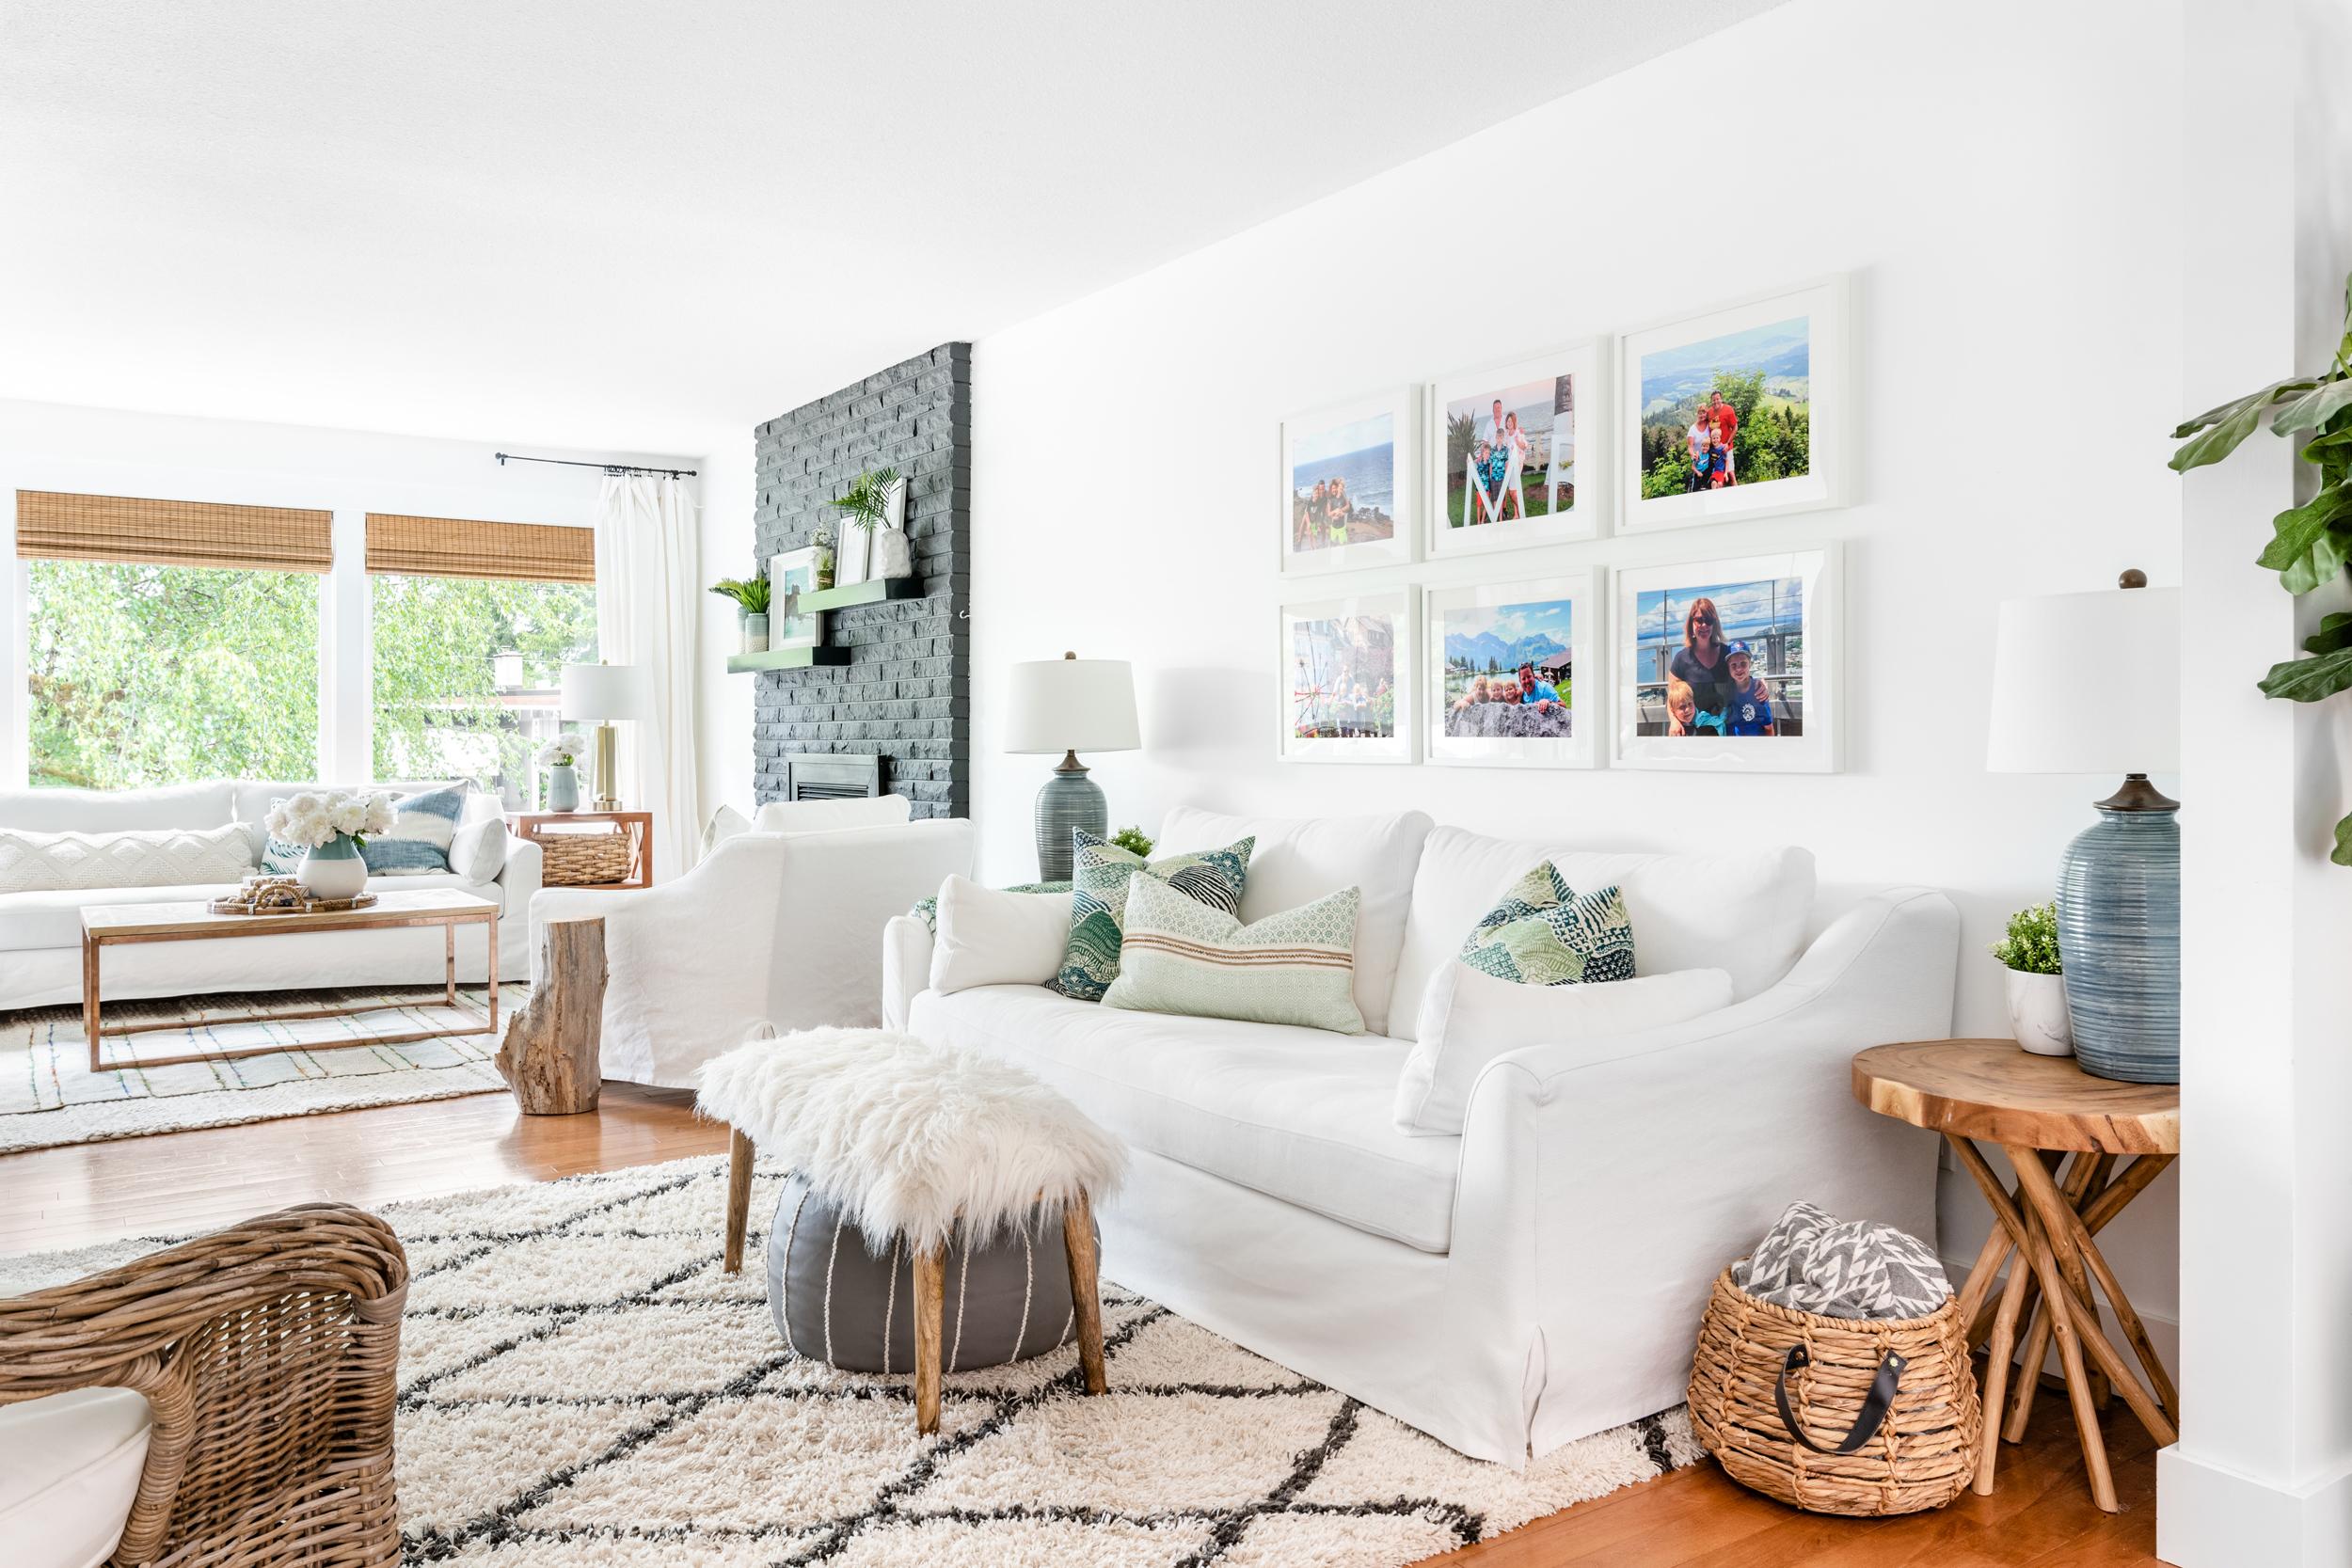 a living room area with a white Ikea Farlov slipcovered sofa and cozy plush area rug